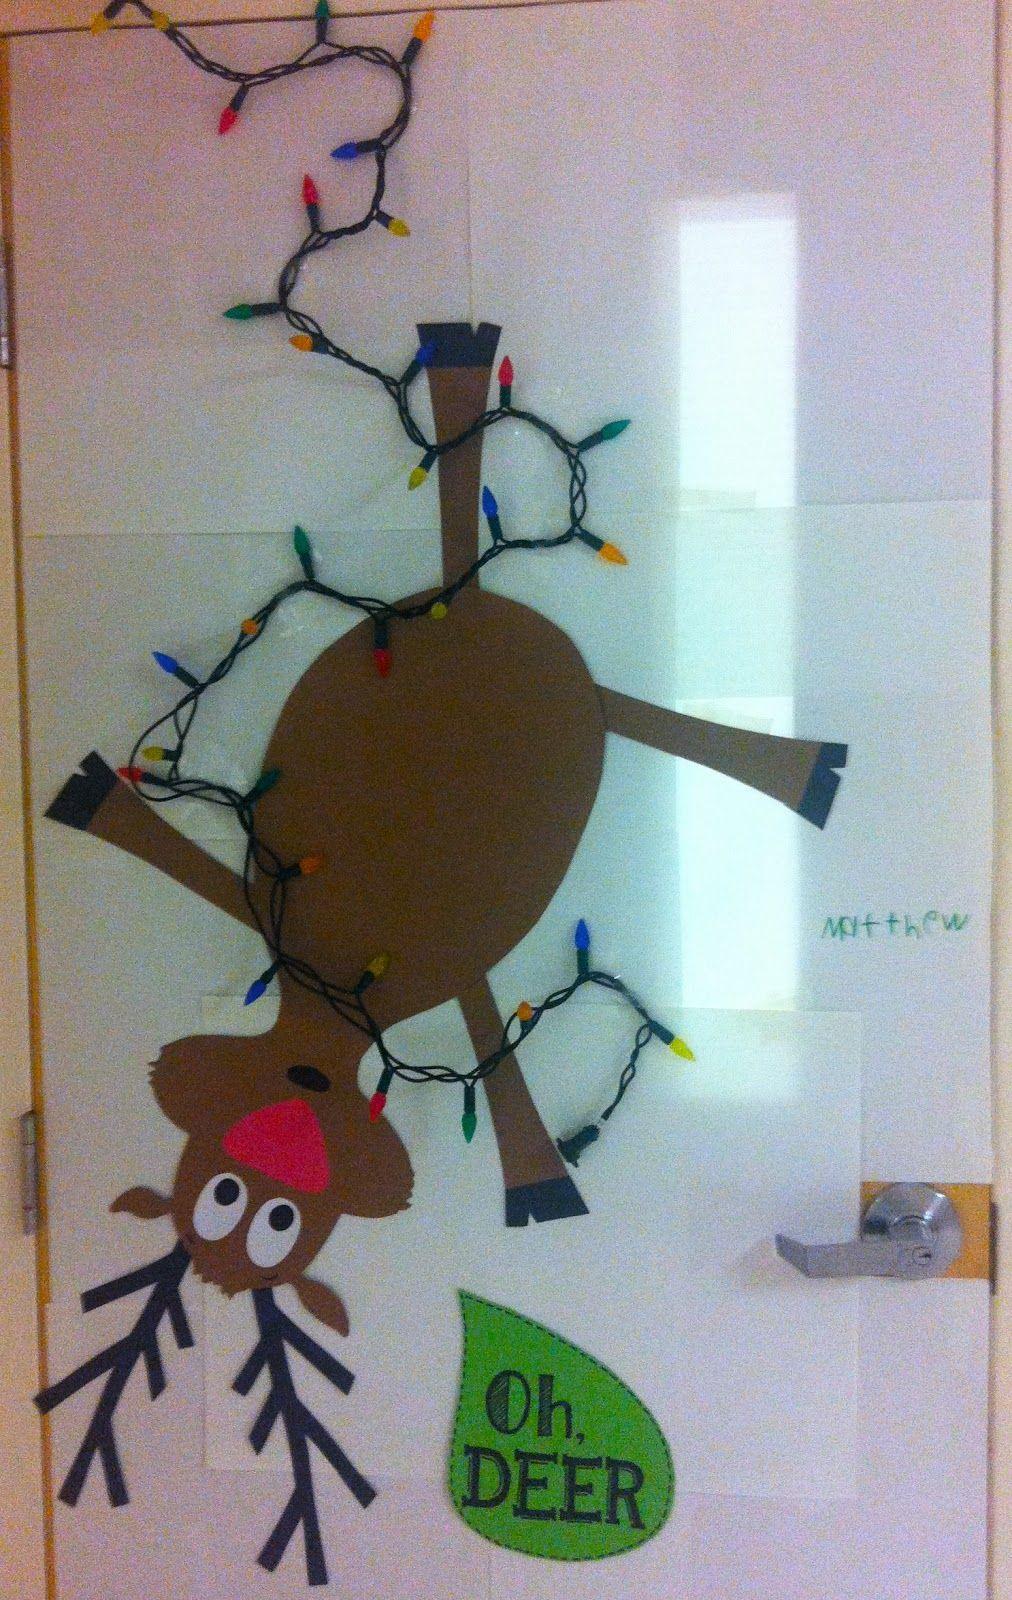 Christmas door decorations - Explore Christmas Door Decorations And More